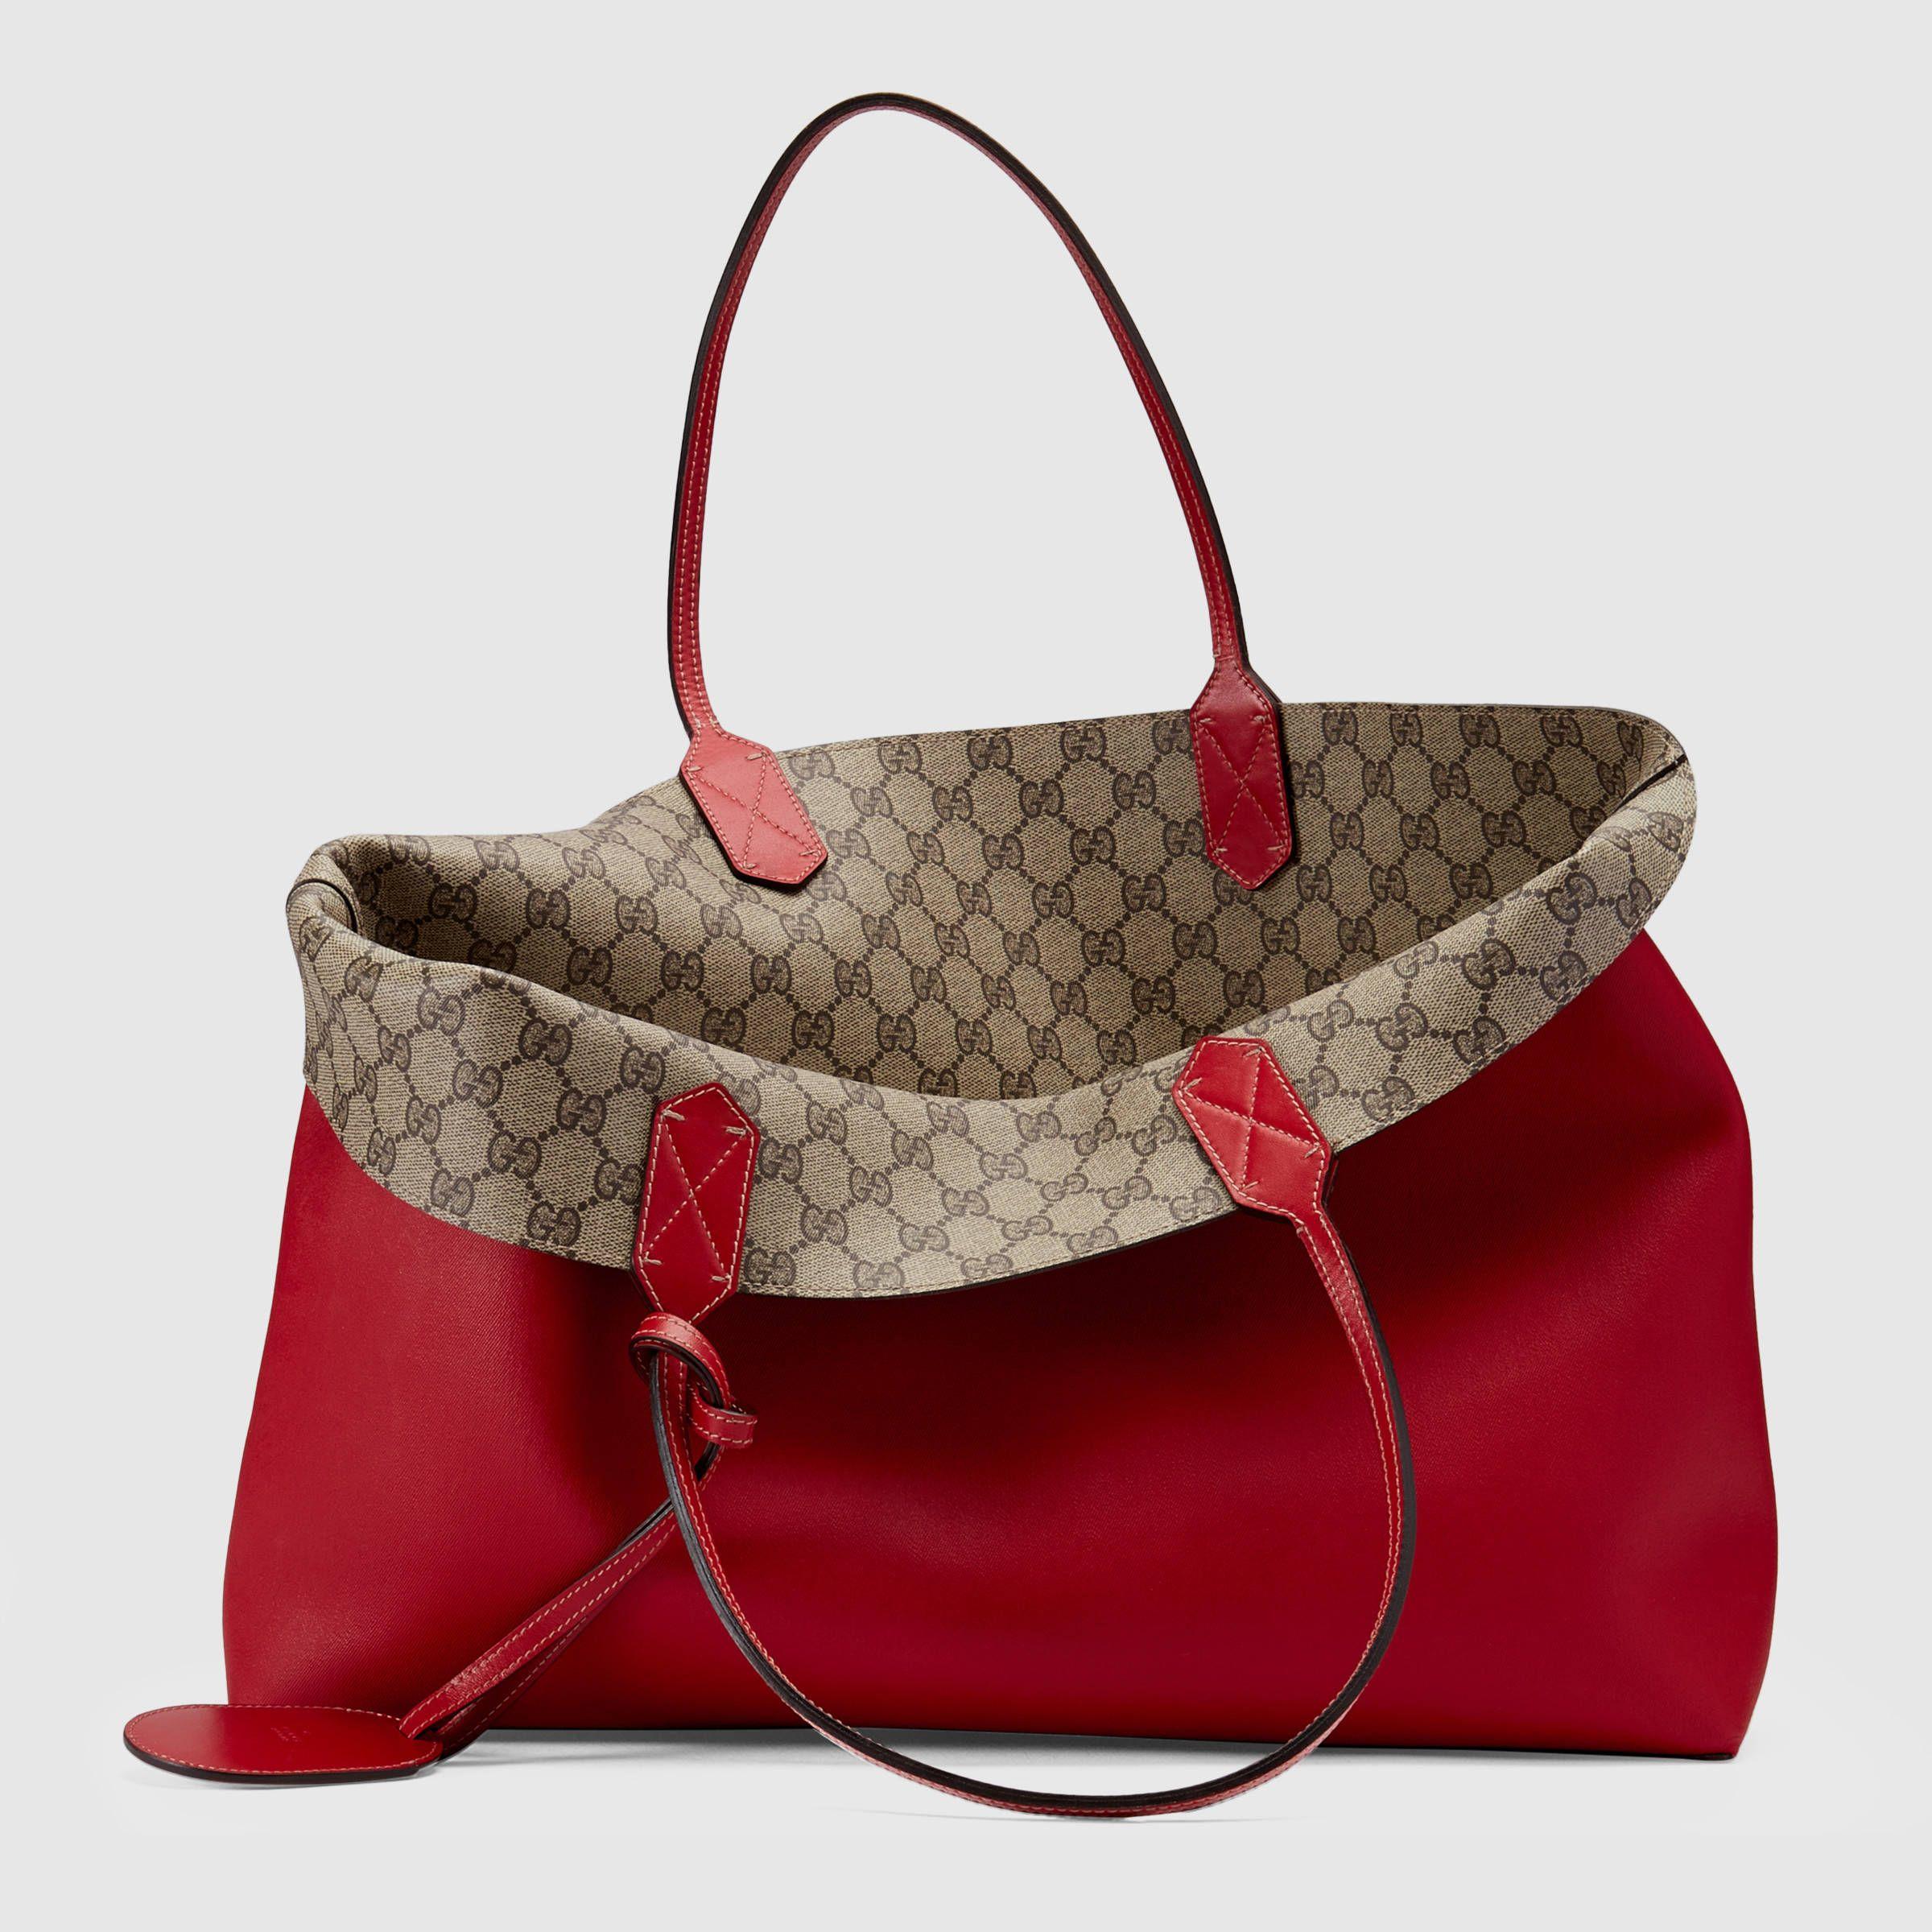 cf4241ea542d2e #gucci #kids #gg #tote #bag #bow #blue #red #detail #style www.jofre.eu |  Kiddo wear | Gucci kids, Gucci, Kids bags